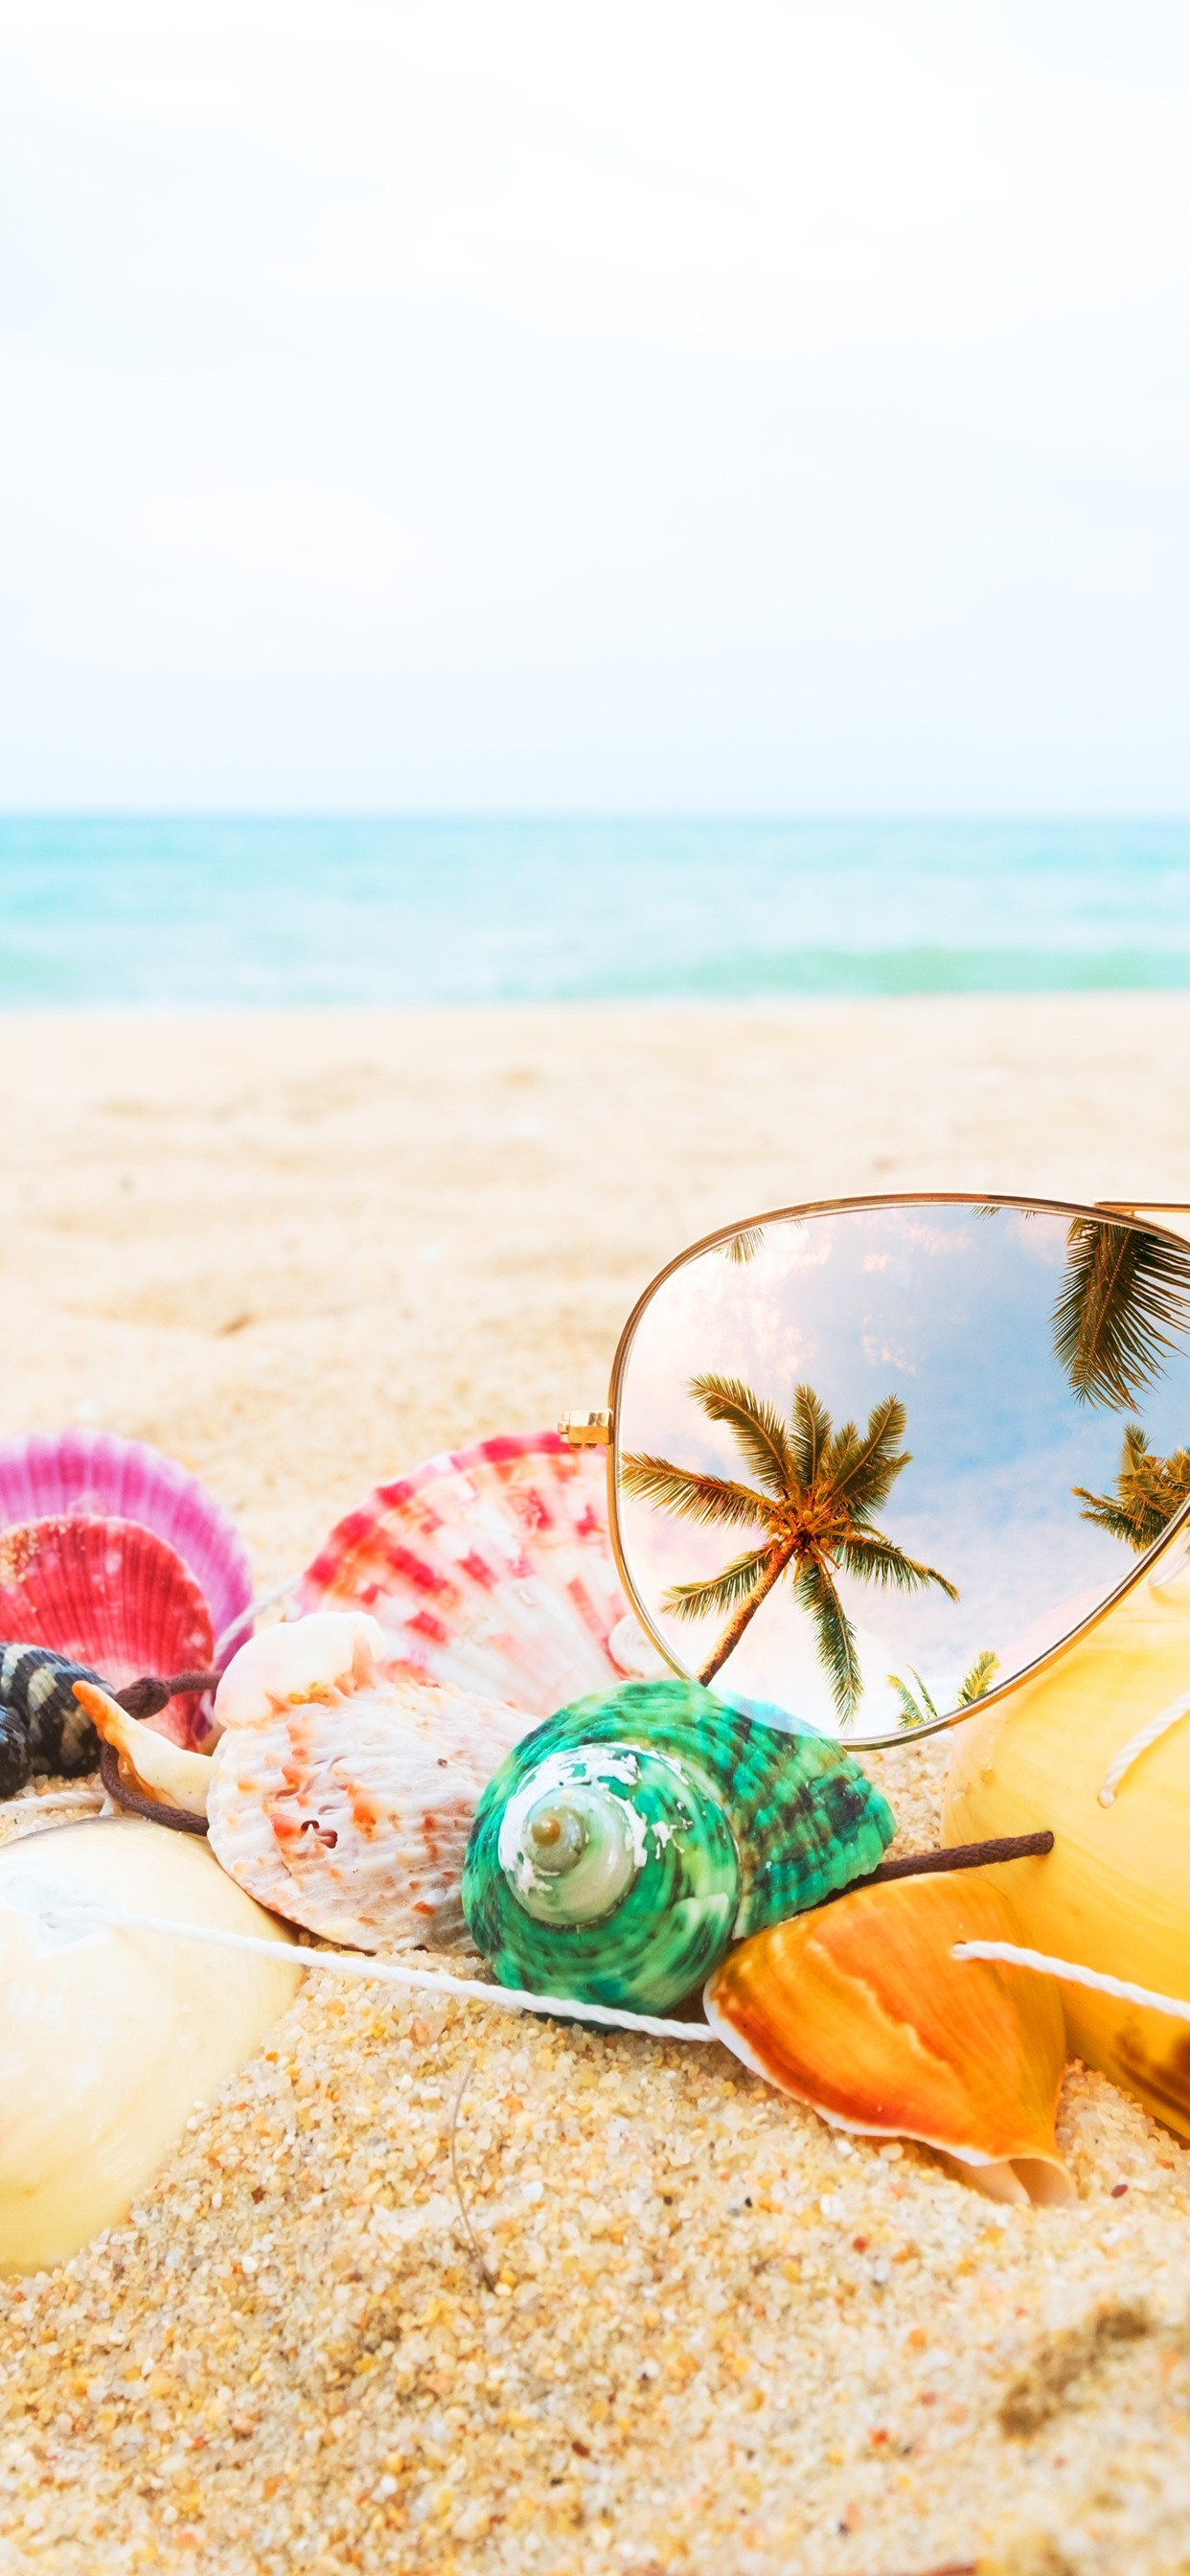 Sunglass Seashell Beach Sea 1242x2688 Iphone Xs Max Wallpaper